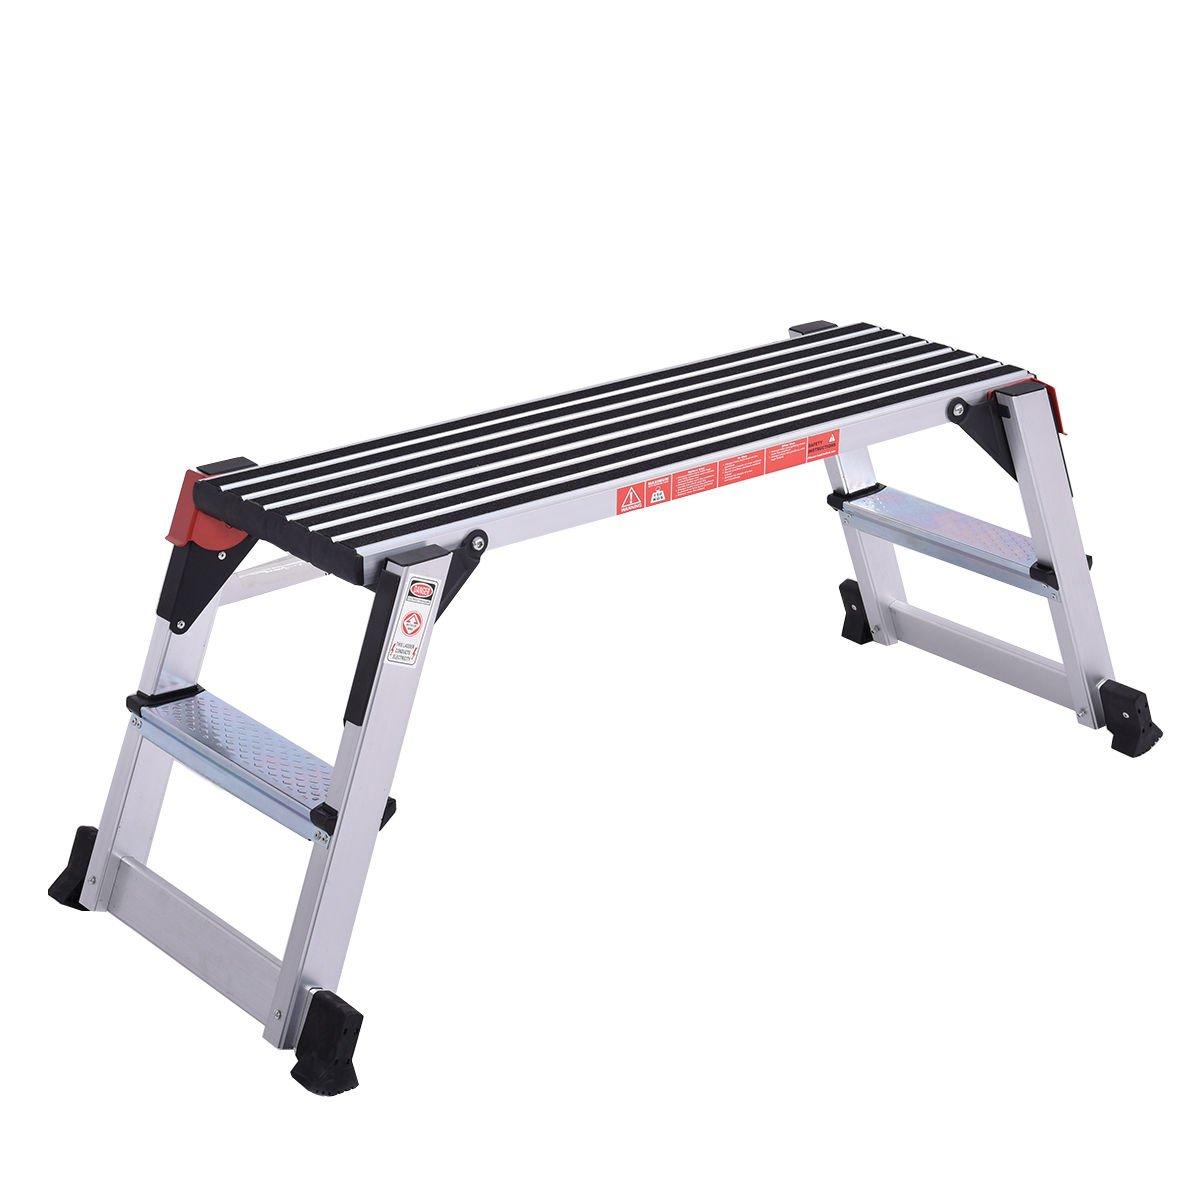 Globe House Products GHP 330-Lbs Capacity Aluminum Non-Slip Step Stool Drywall Ladder Folding Platform